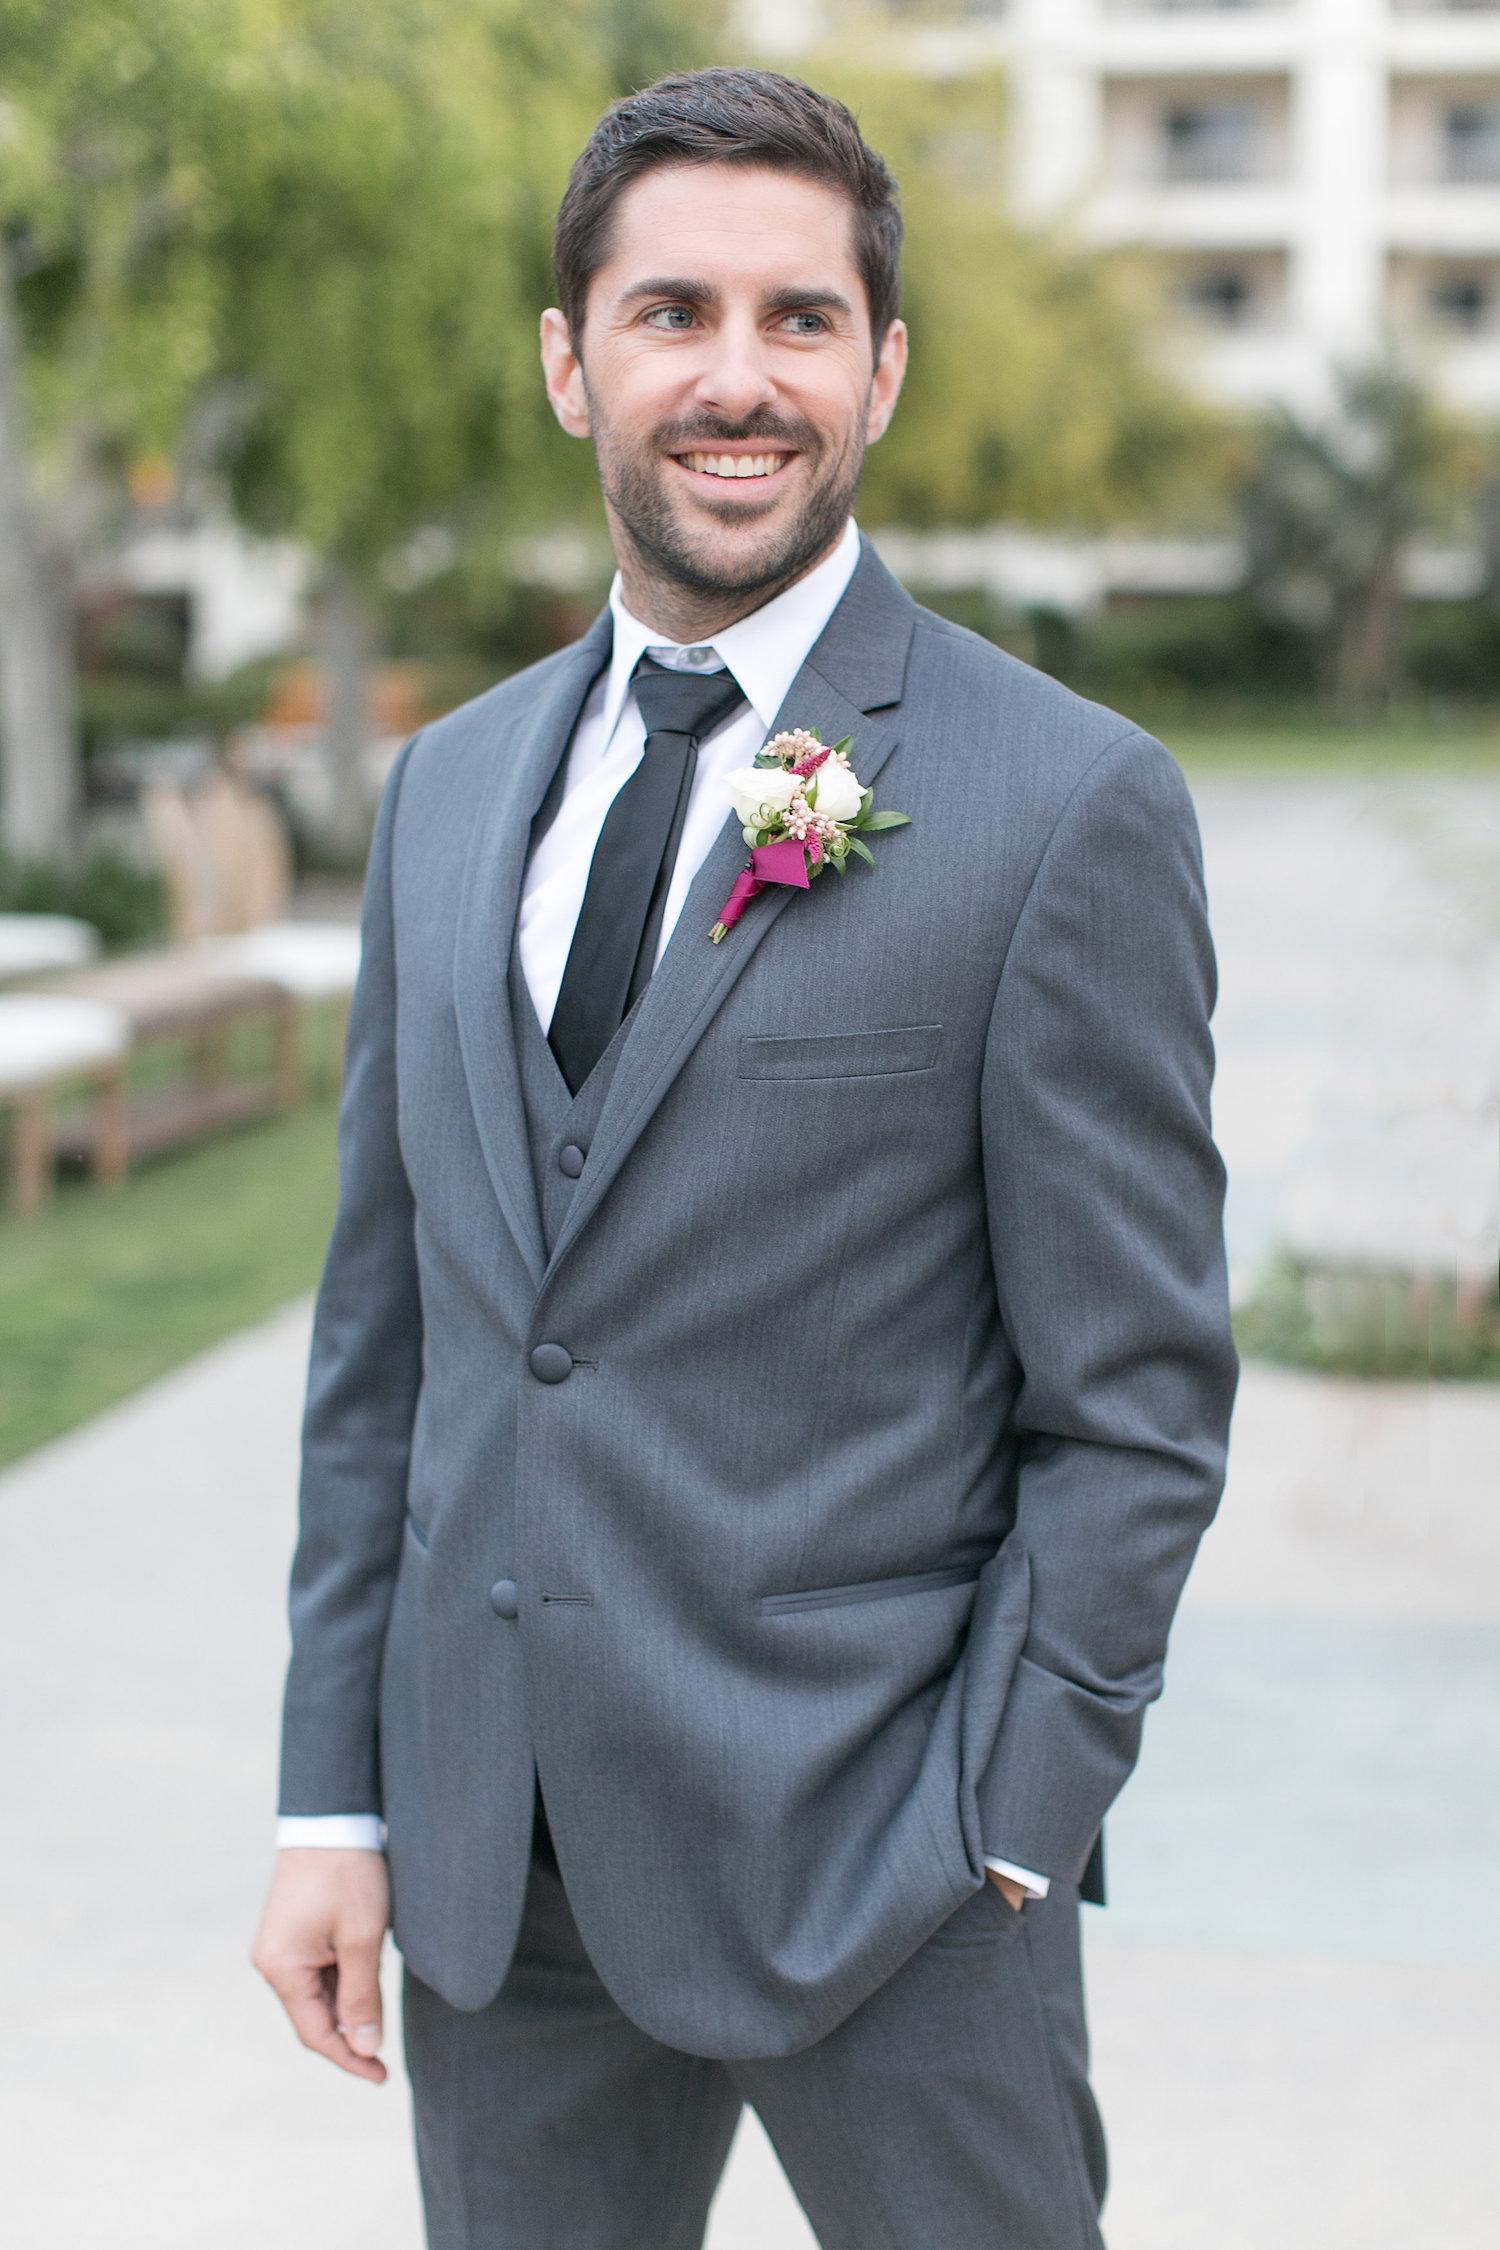 Marsala & blush boutonniere by San Diego wedding florist, Compass Floral.